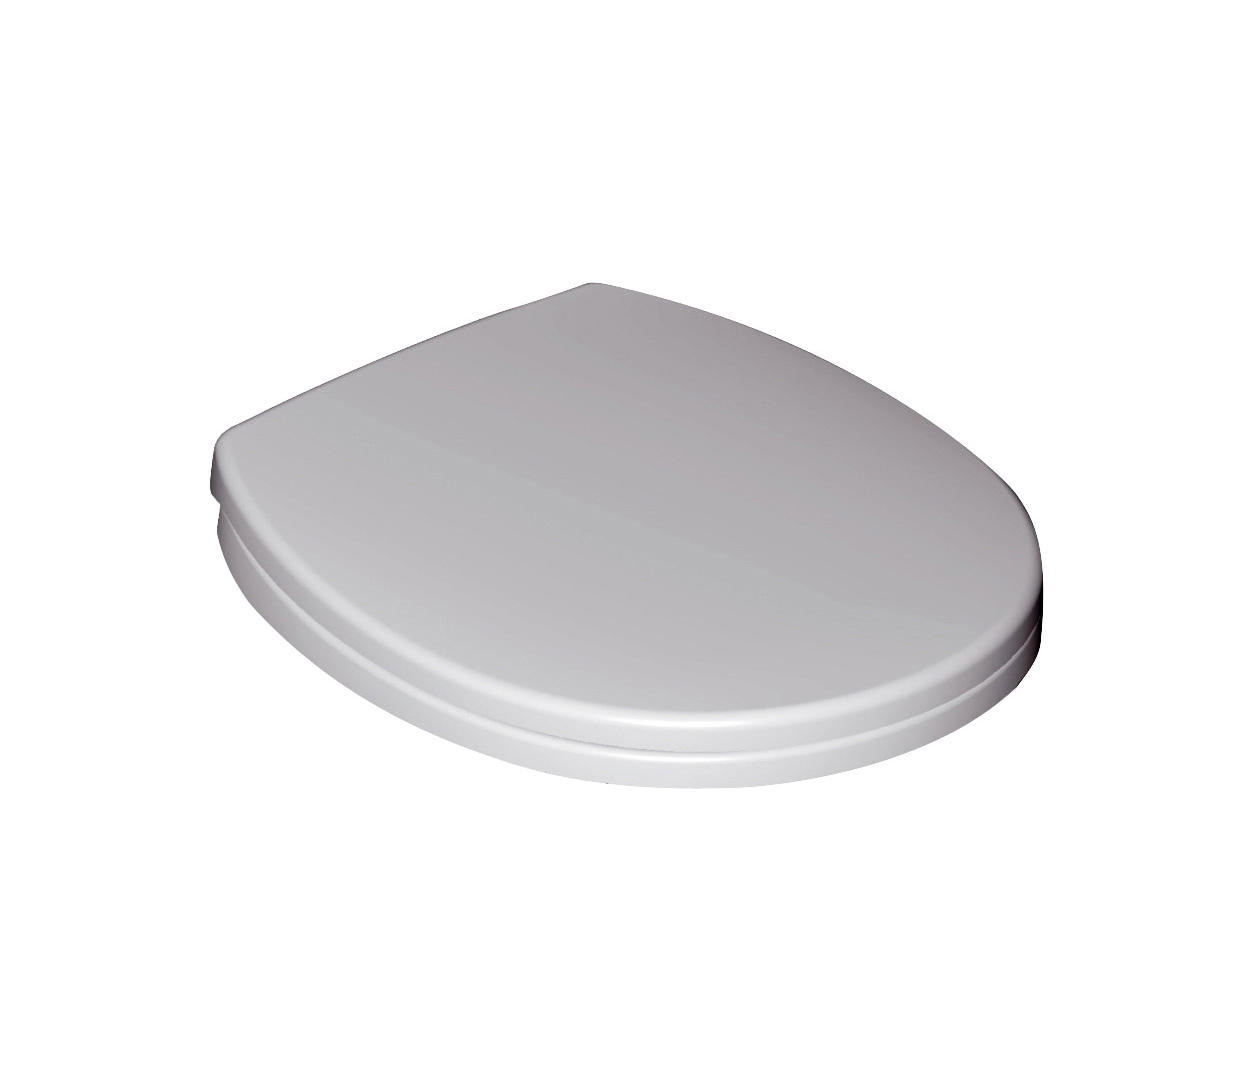 contour 21 wc sitz inodoros de ideal standard architonic. Black Bedroom Furniture Sets. Home Design Ideas